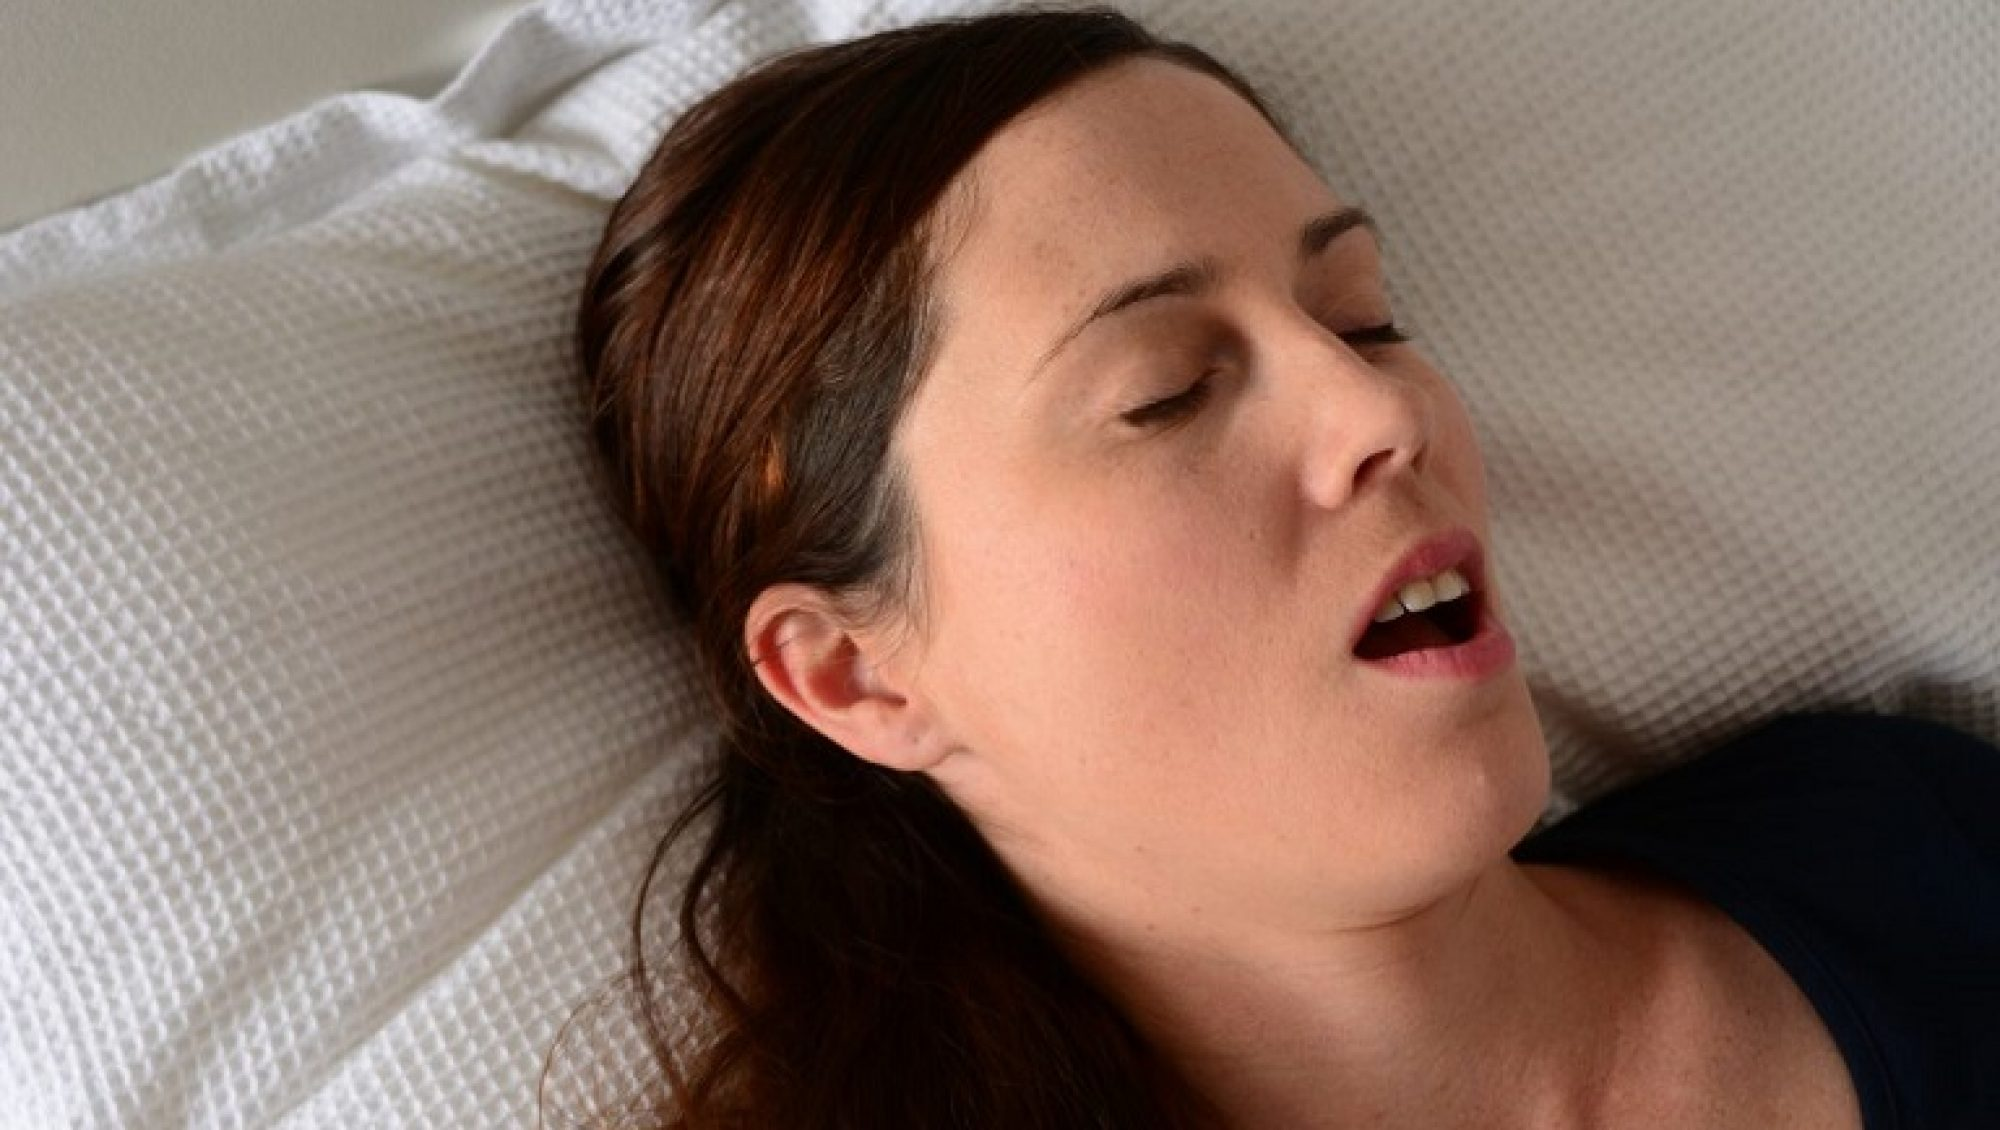 IMO Blog - Categoría: medicina bariátrica - bariátrica-La-Apnea-Obstructiva-IMOBariátrica-768x509